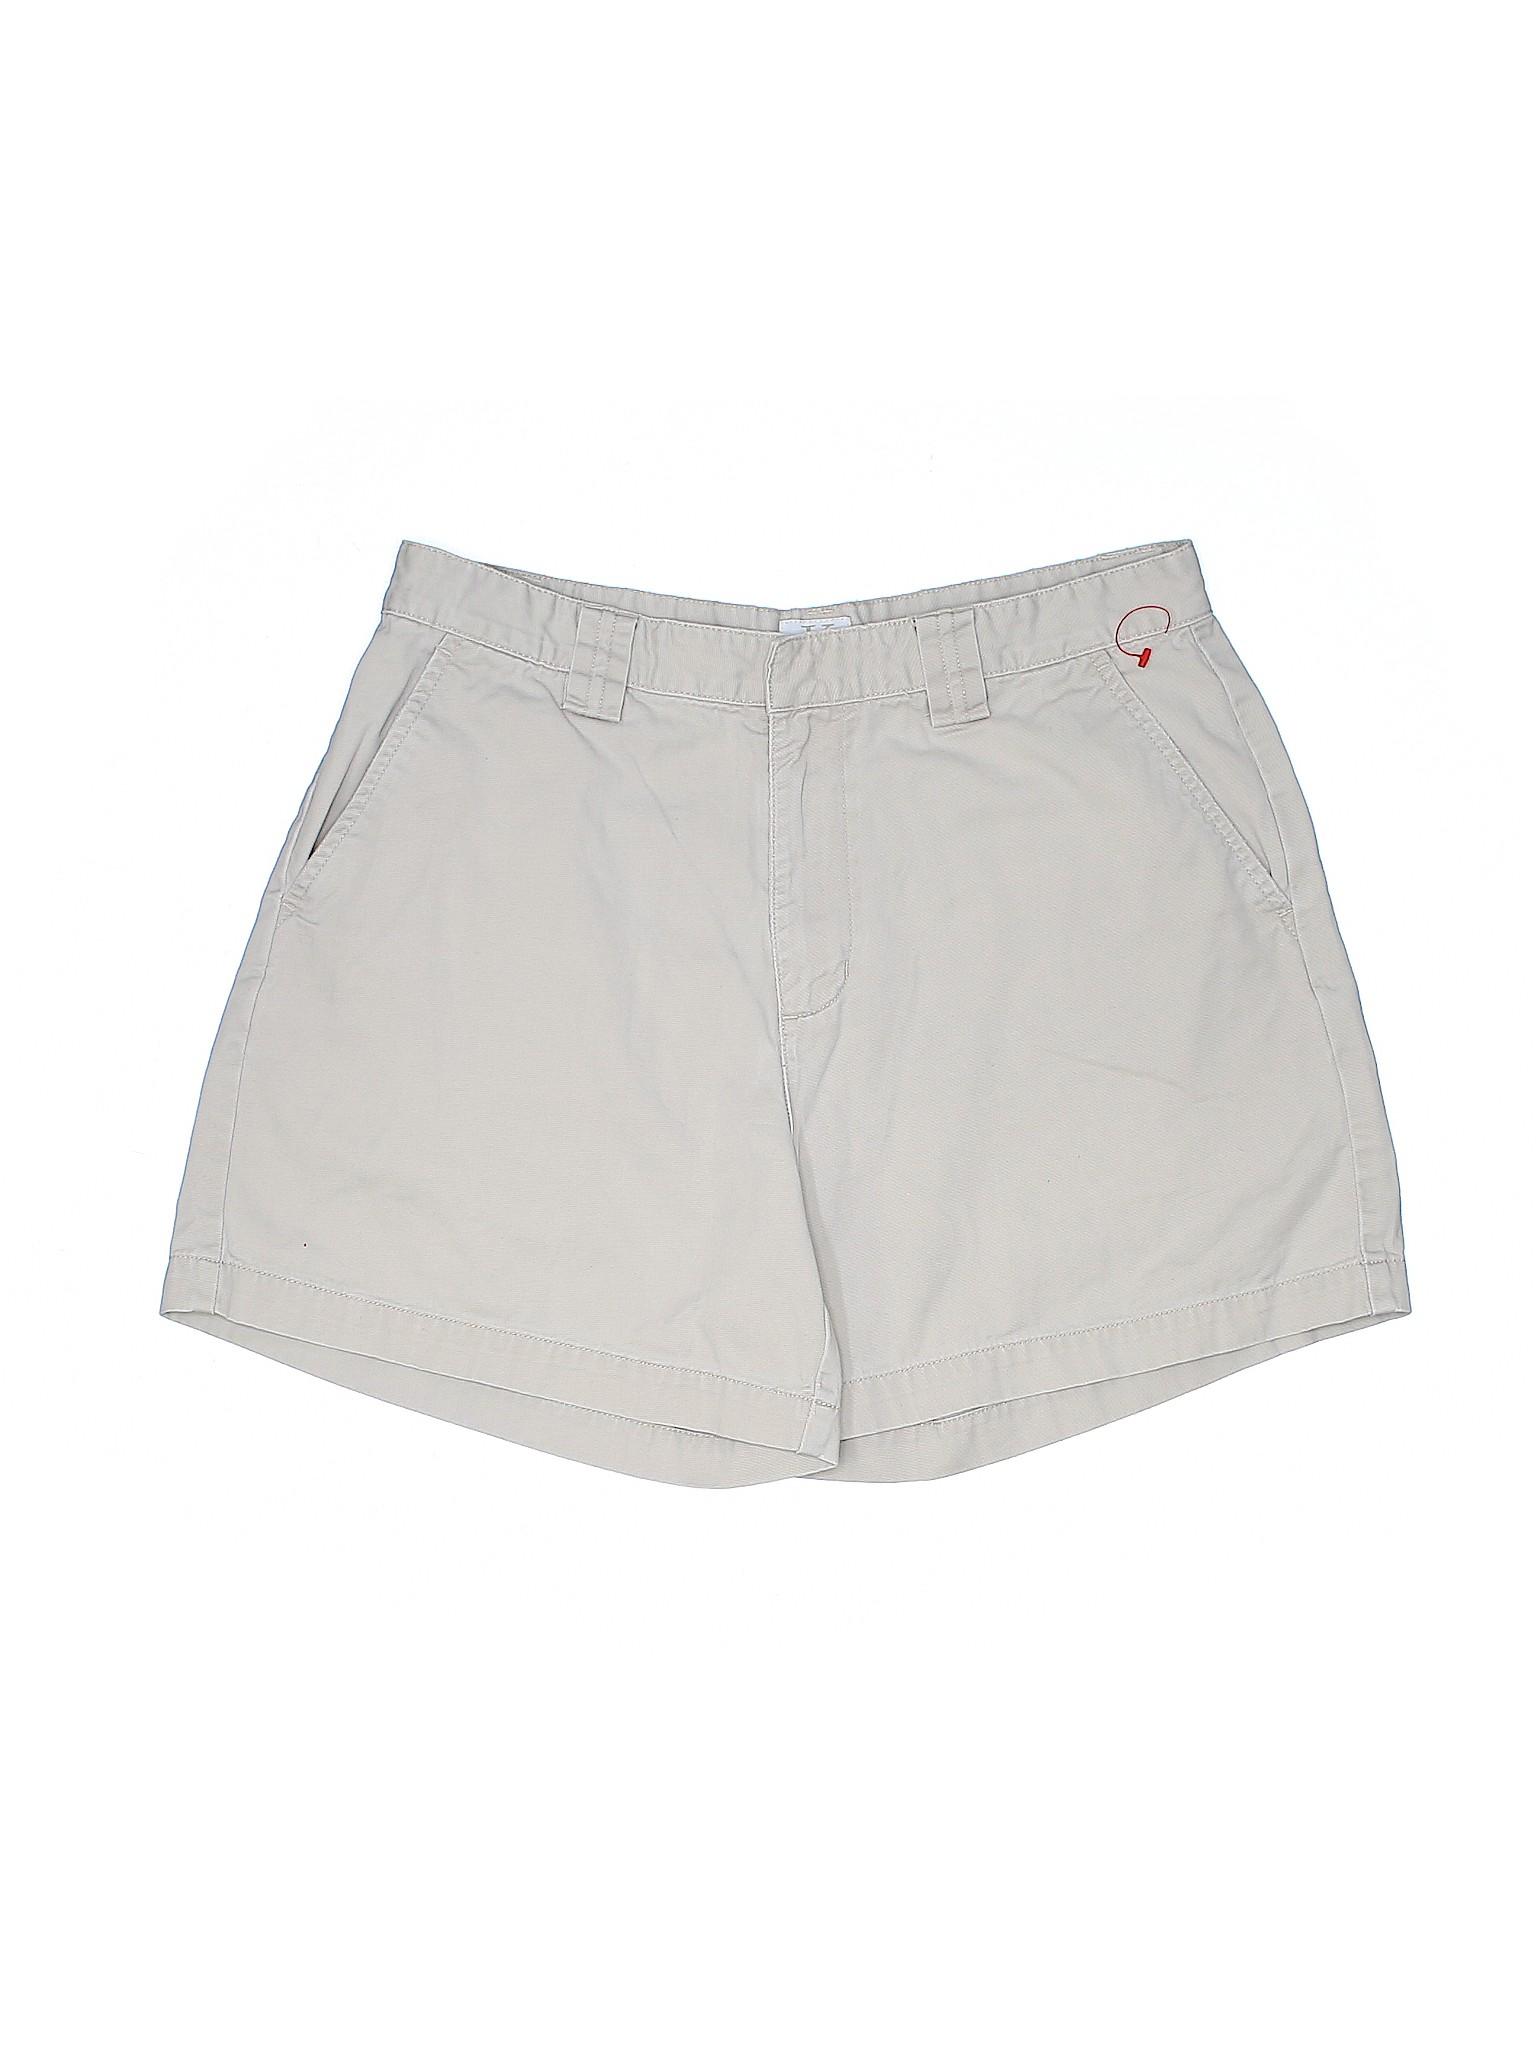 CALVIN Shorts leisure JEANS Khaki KLEIN Boutique n5qw8xTW77